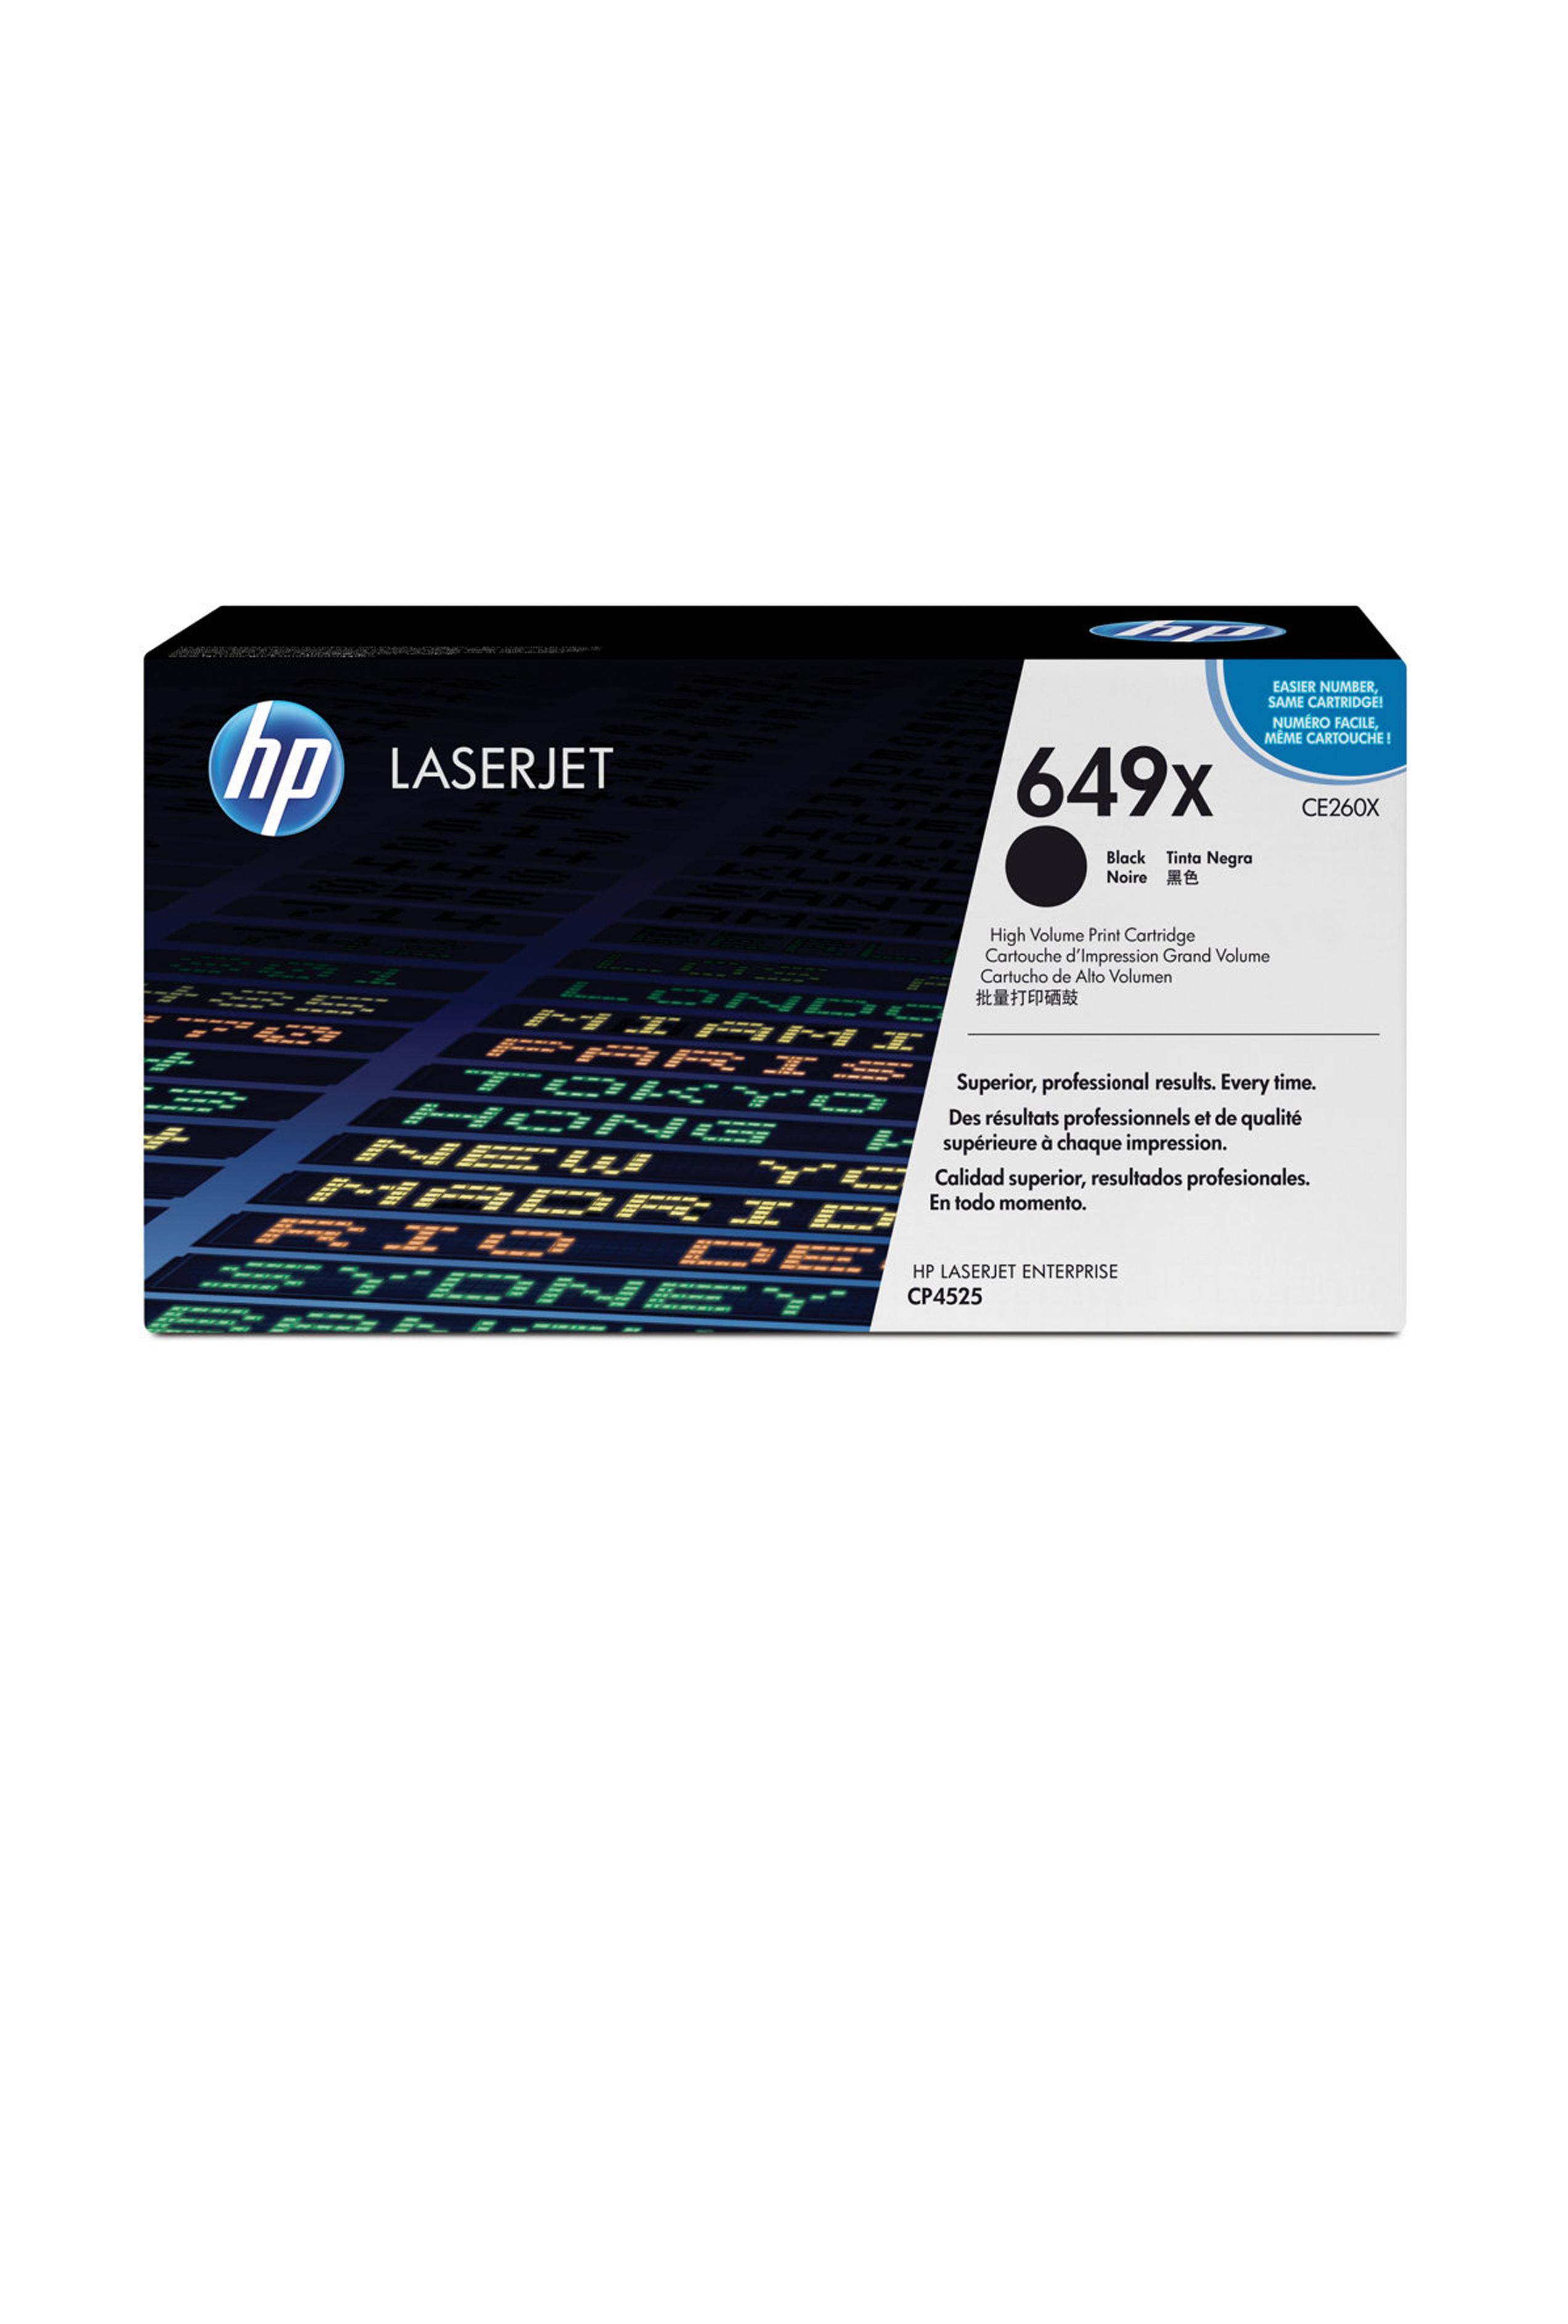 HP High Volume Print Cartridge (CE260XC)